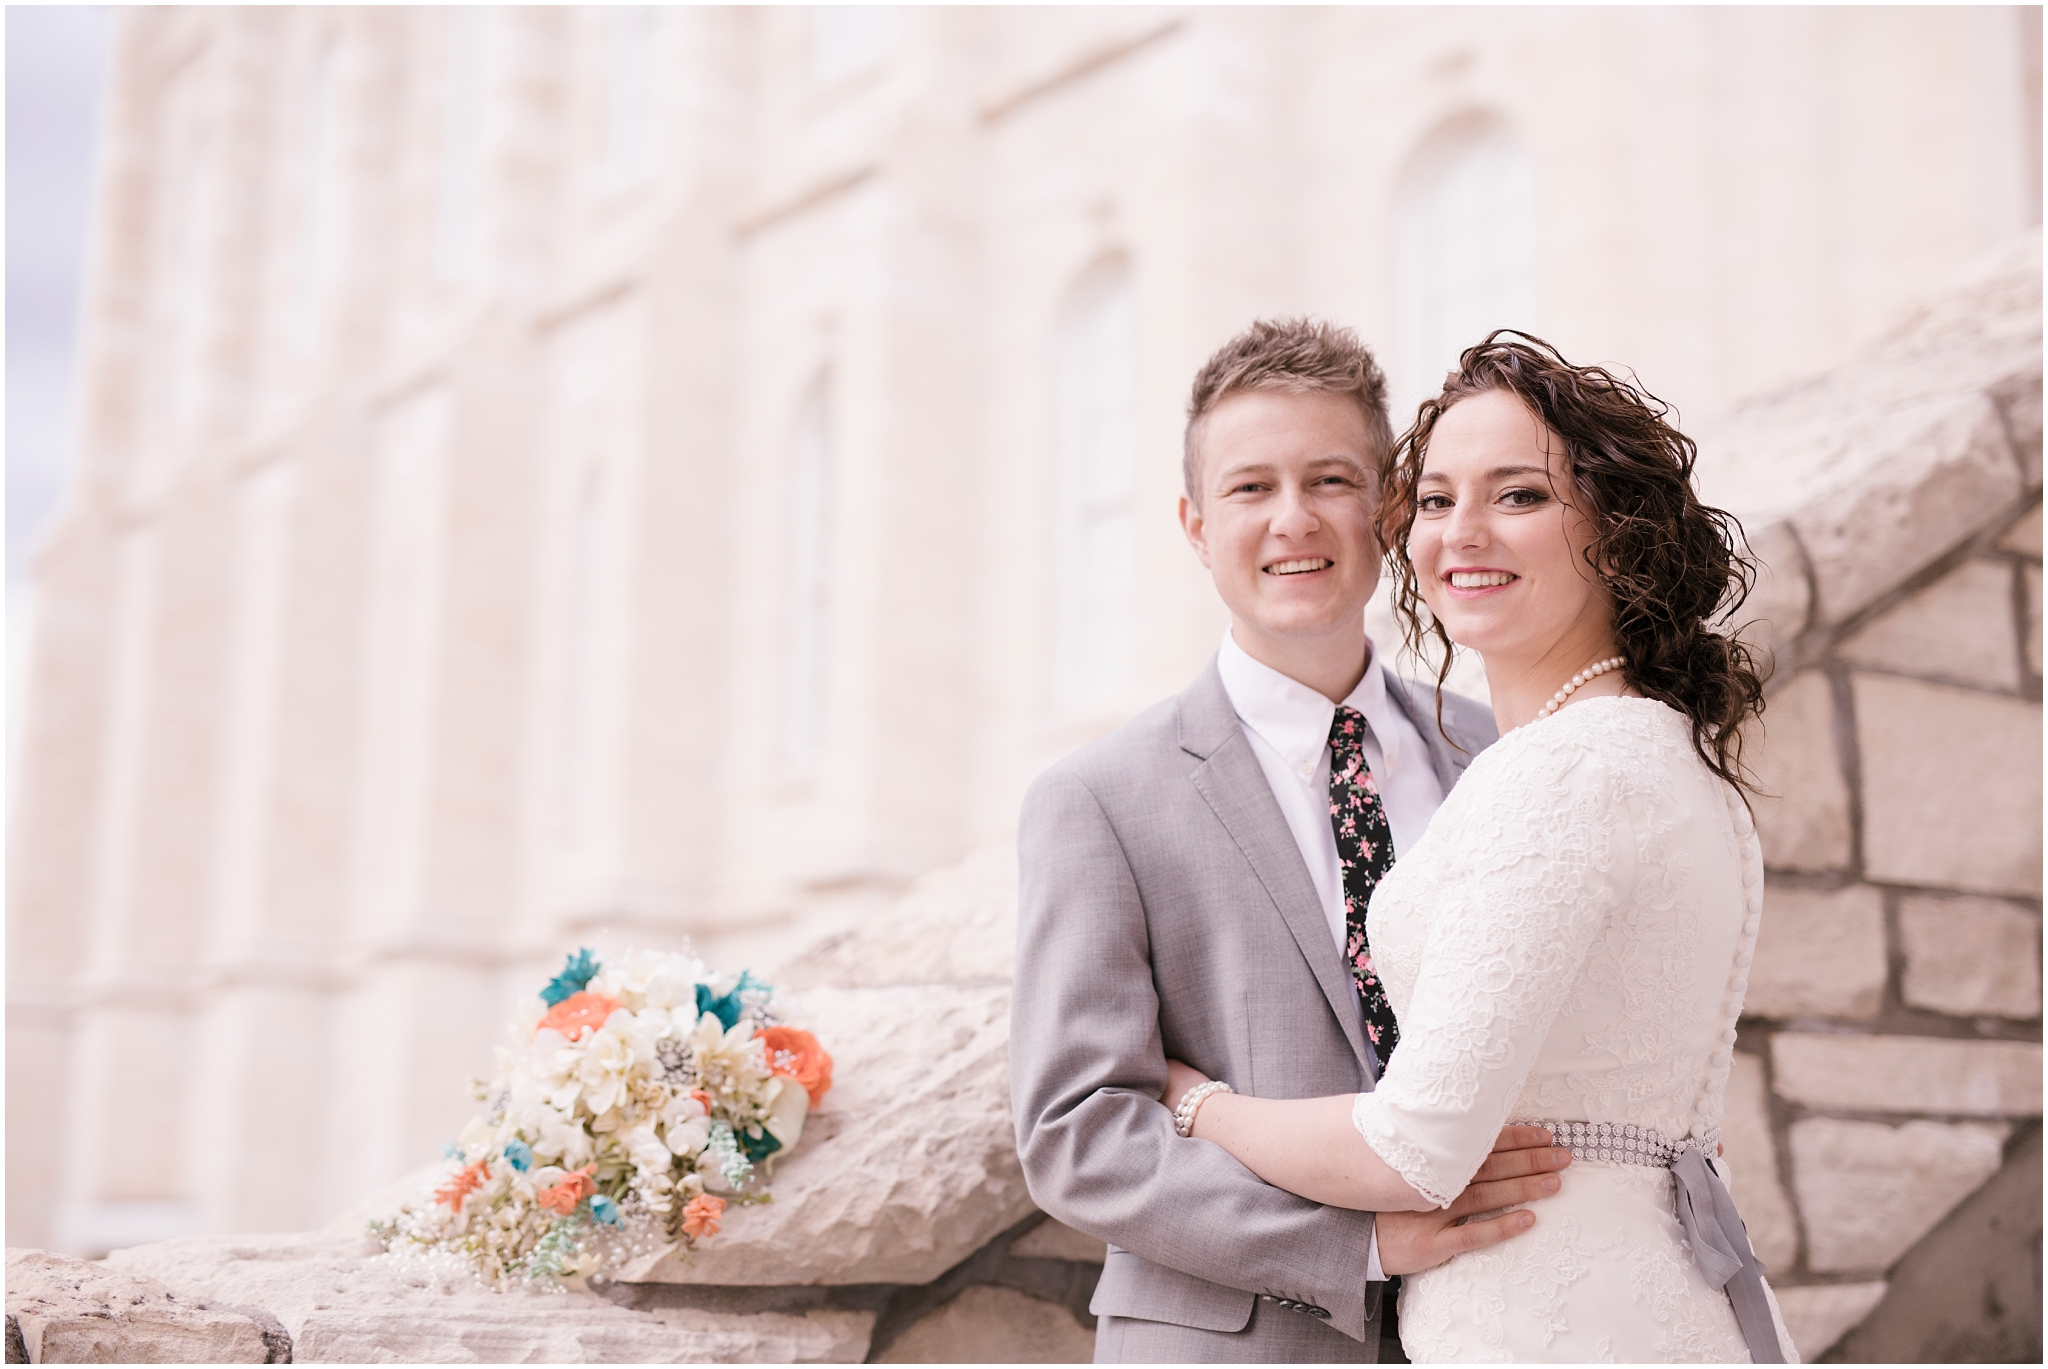 BA-Bridals-142_Lizzie-B-Imagery-Utah-Wedding-Photographer-Central-Utah-Photographer-Utah-County-Manti-Utah-Temple.jpg